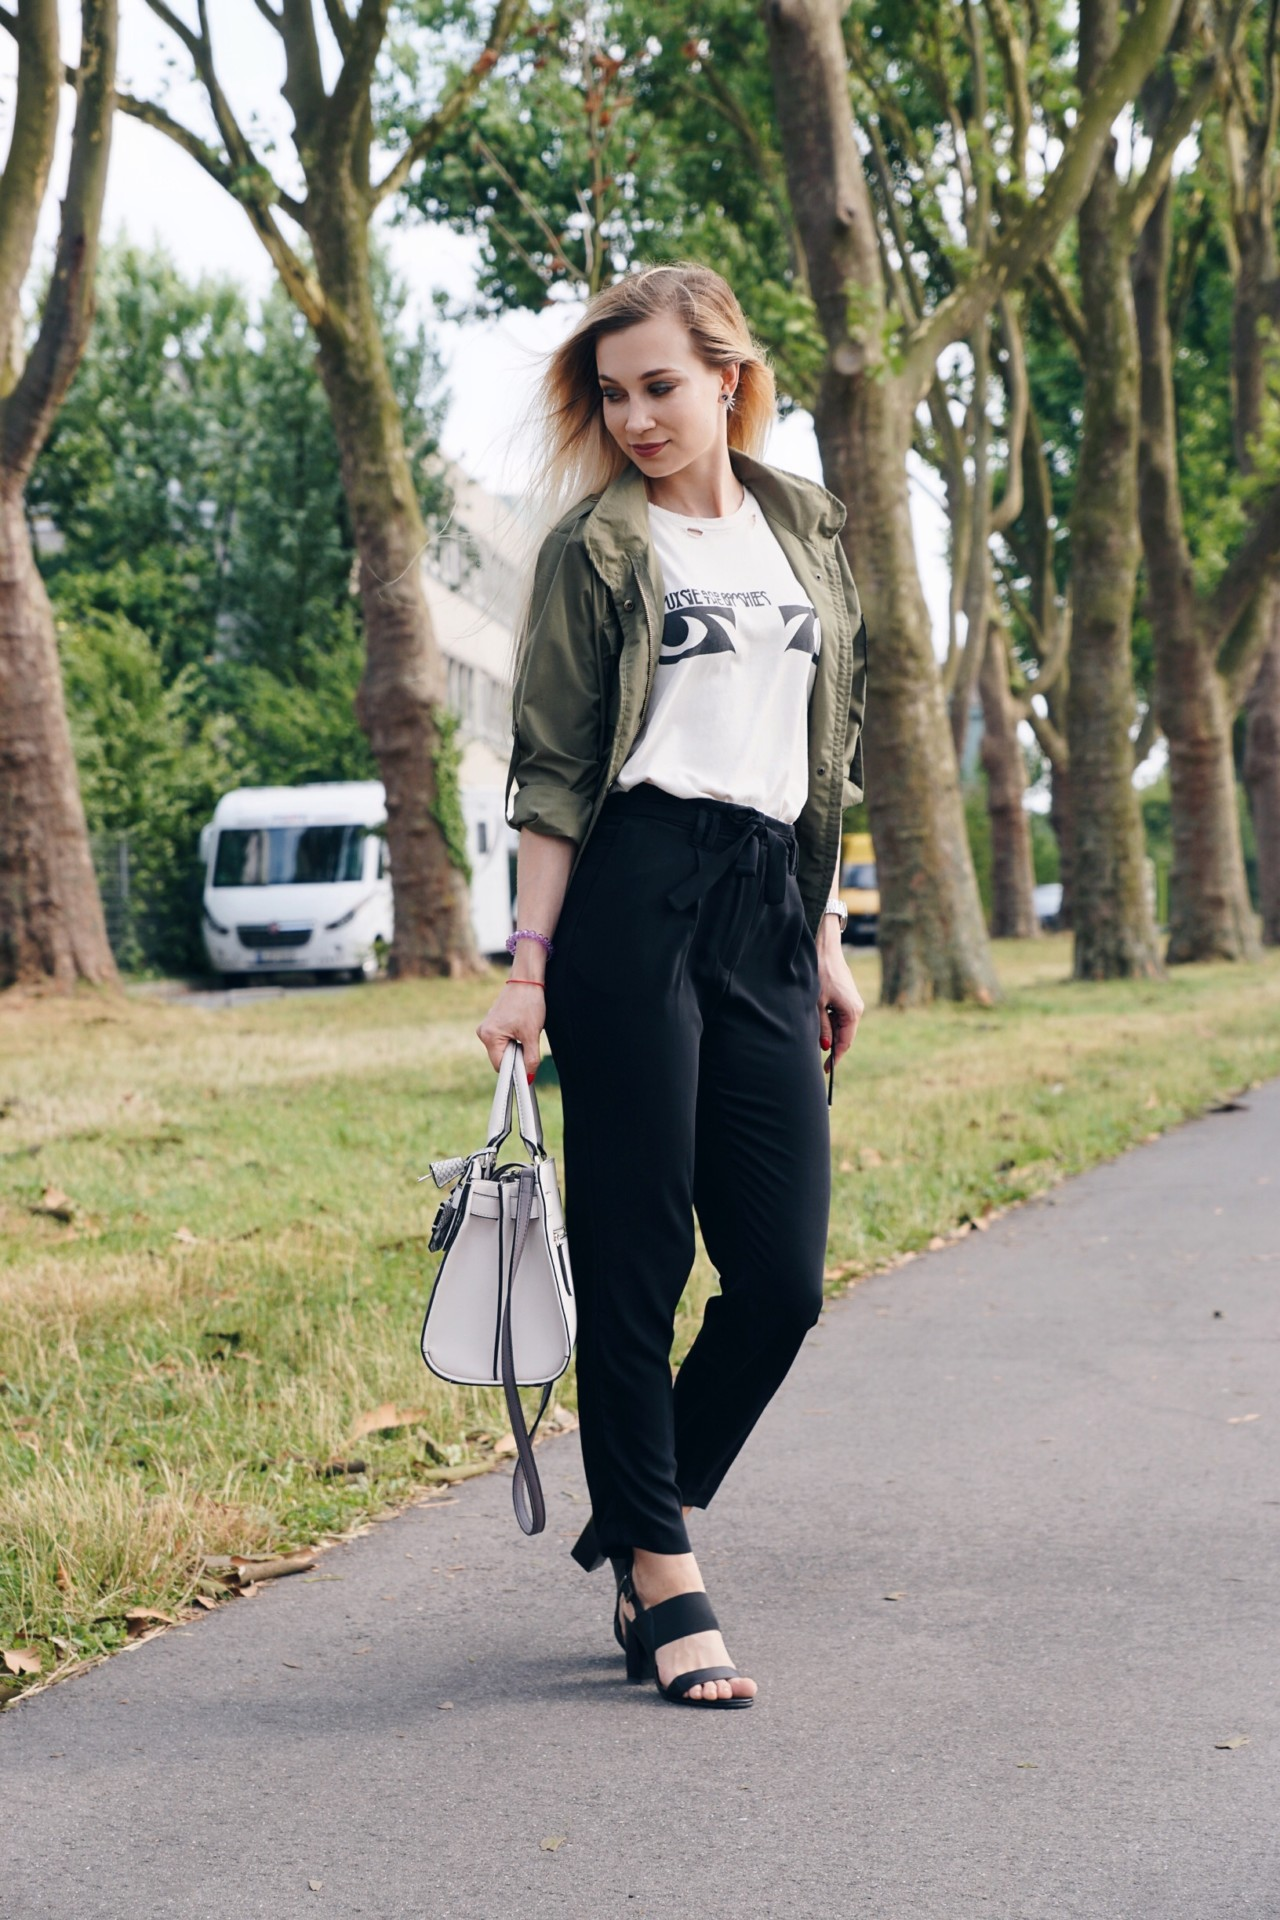 Herbsttrends_fashionblog_streetstyle_blog_dbkstylez_мода_стиль_осенние_тренды